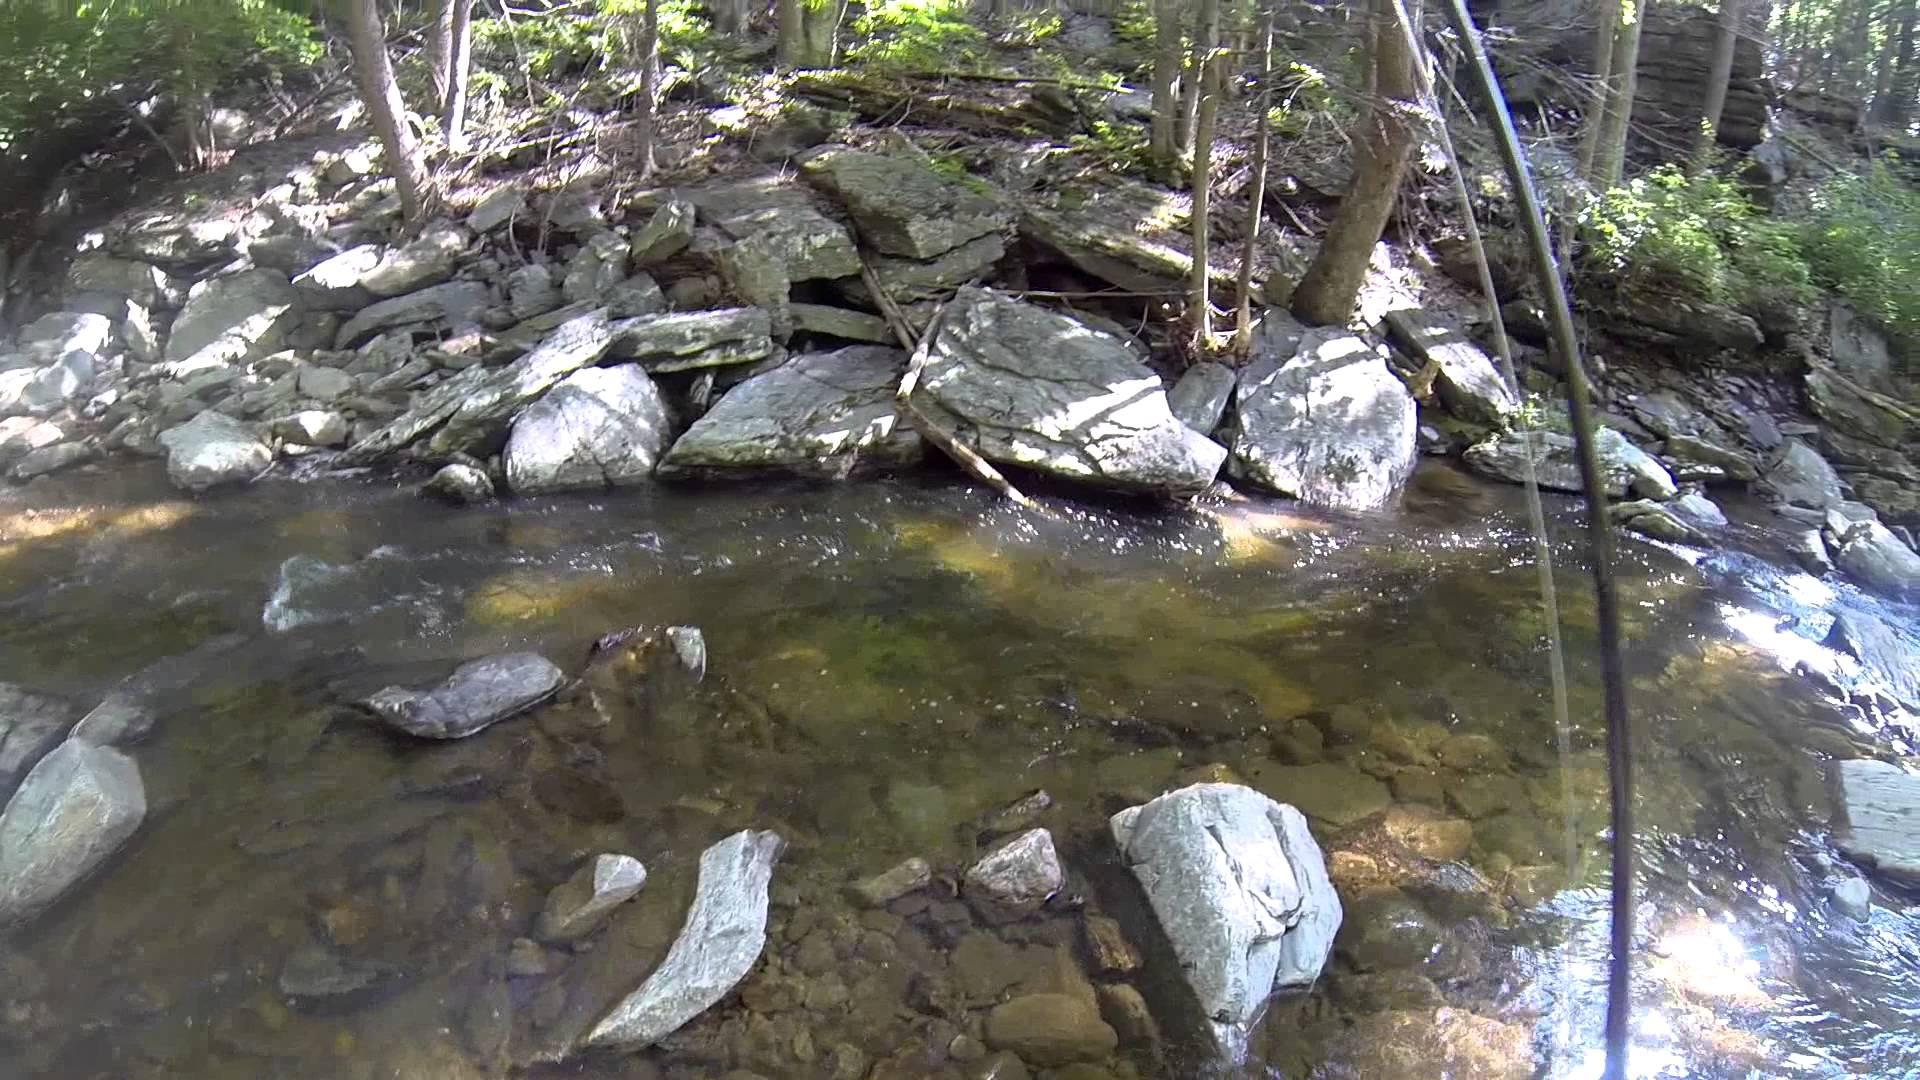 Fly Fishing Big Hunting Creek 05/31/14 Thurmont, MD - YouTube